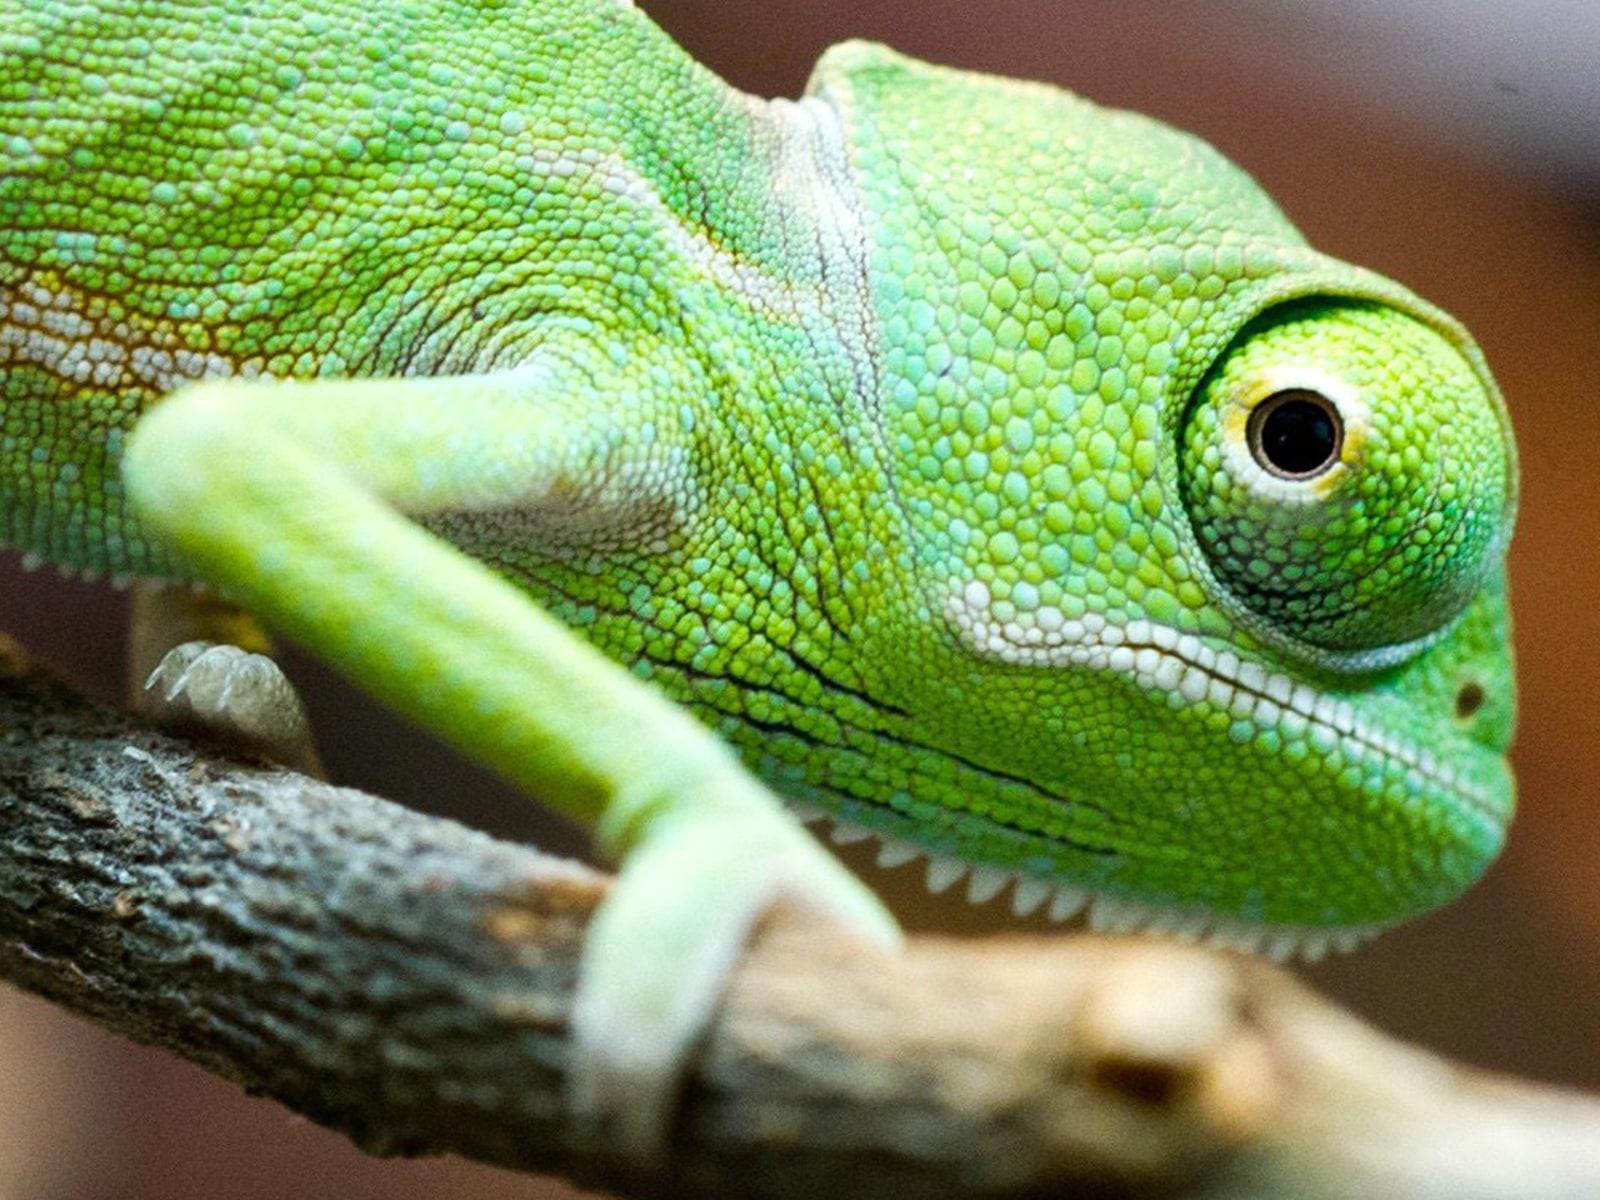 Image: Baby chameleon at Cottbus Zoo